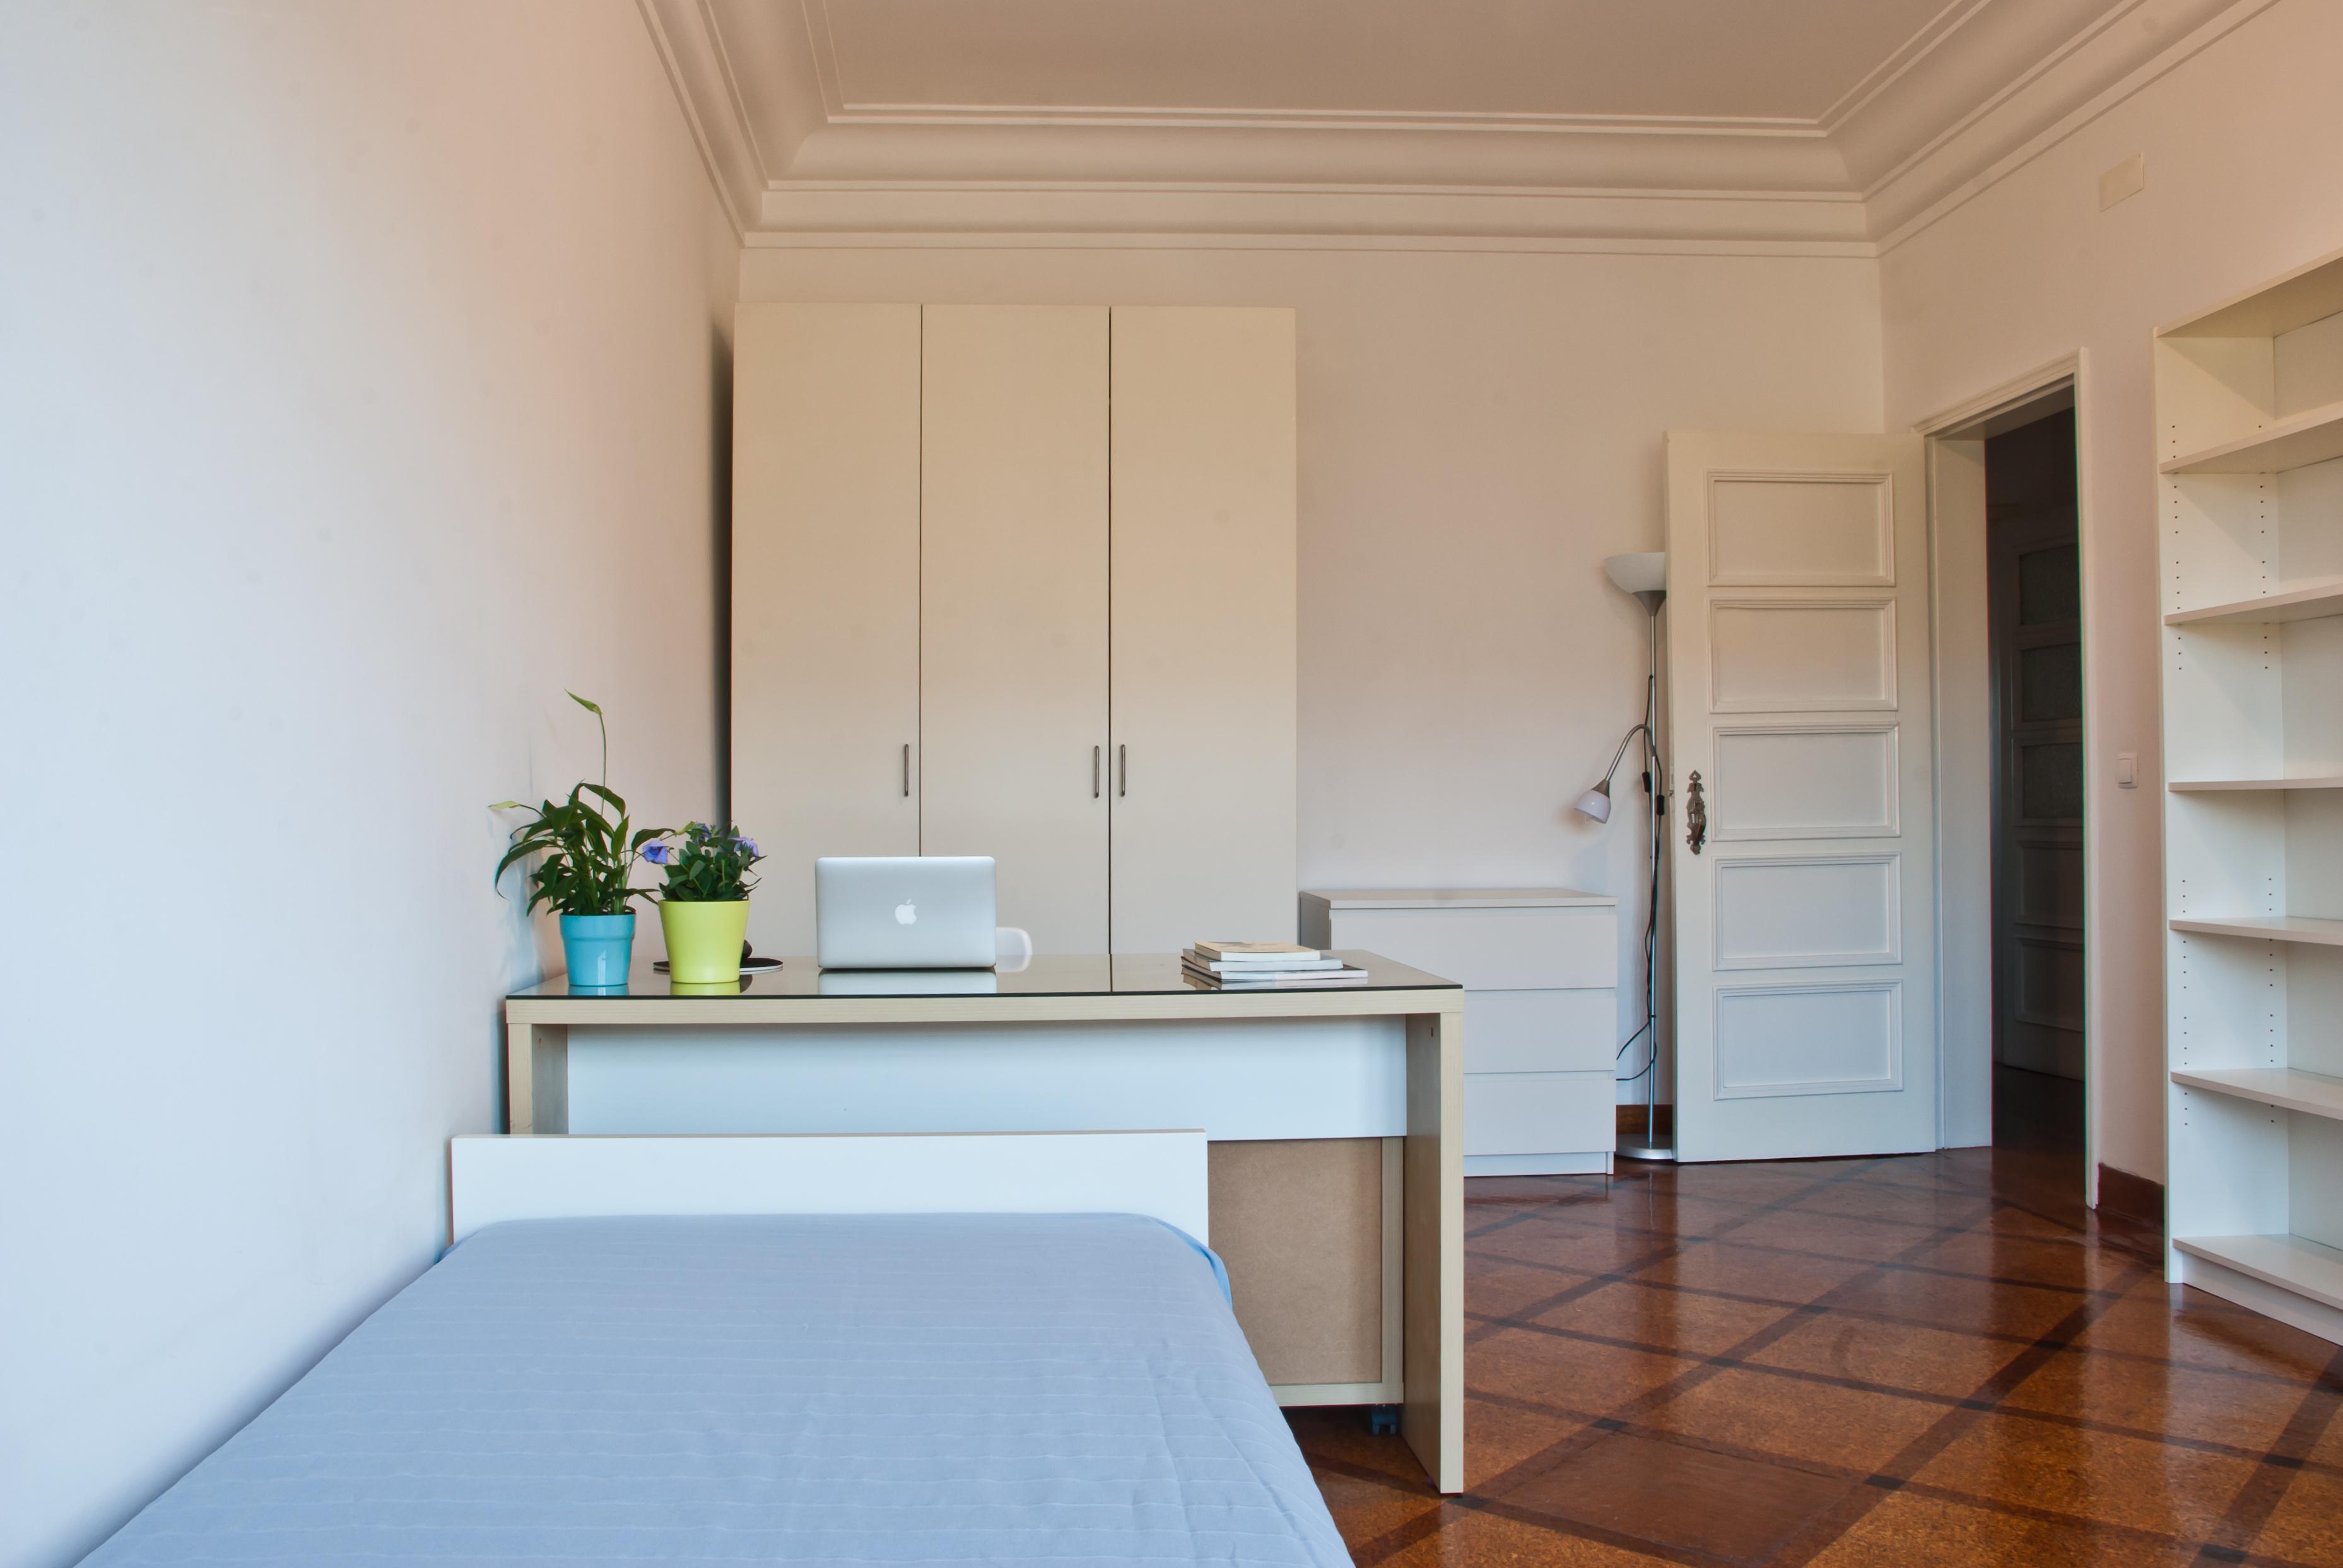 AL_-_Quarto.Room_nº1_-_Foto_3.jpg